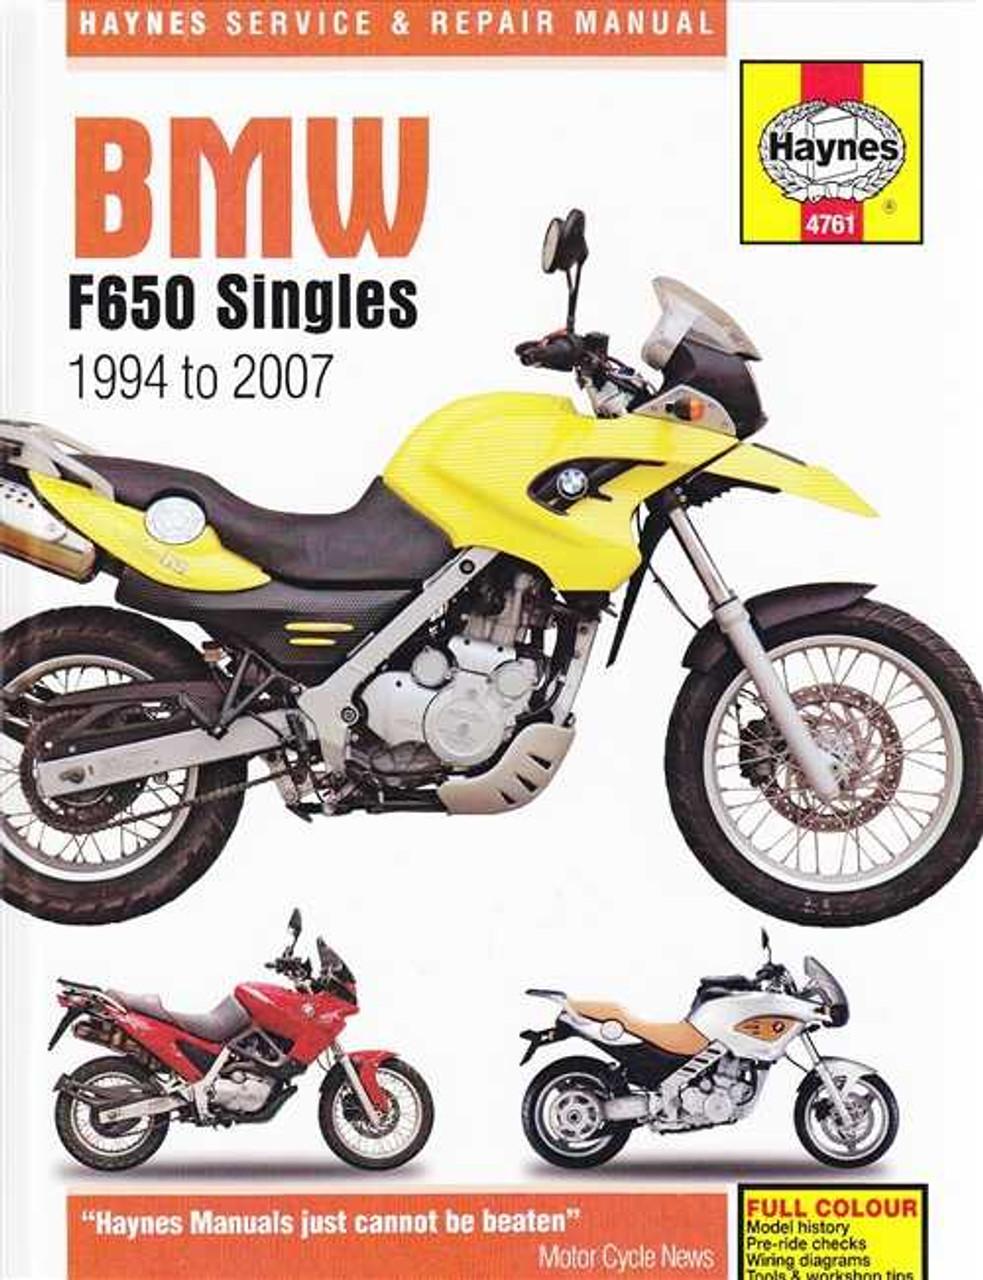 Bmw F650 Singles 1994 2007 Workshop Manualrhautomotobookshopau: 1997 Bmw 650 Wiring Diagram At Gmaili.net